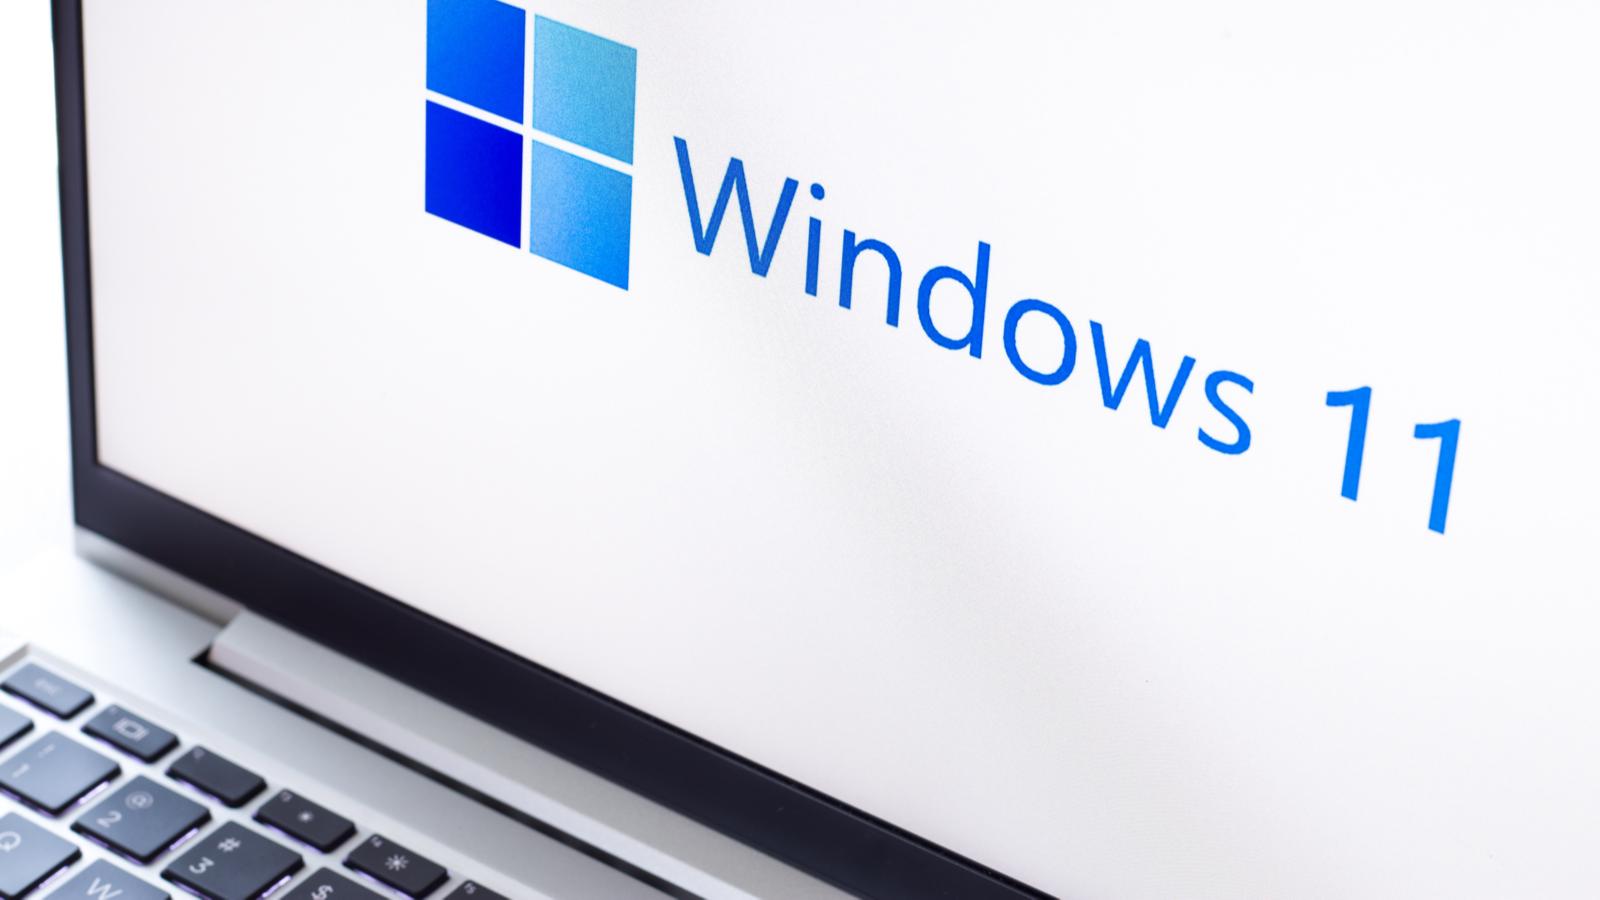 Close-up of Windows 11 logo on a laptop